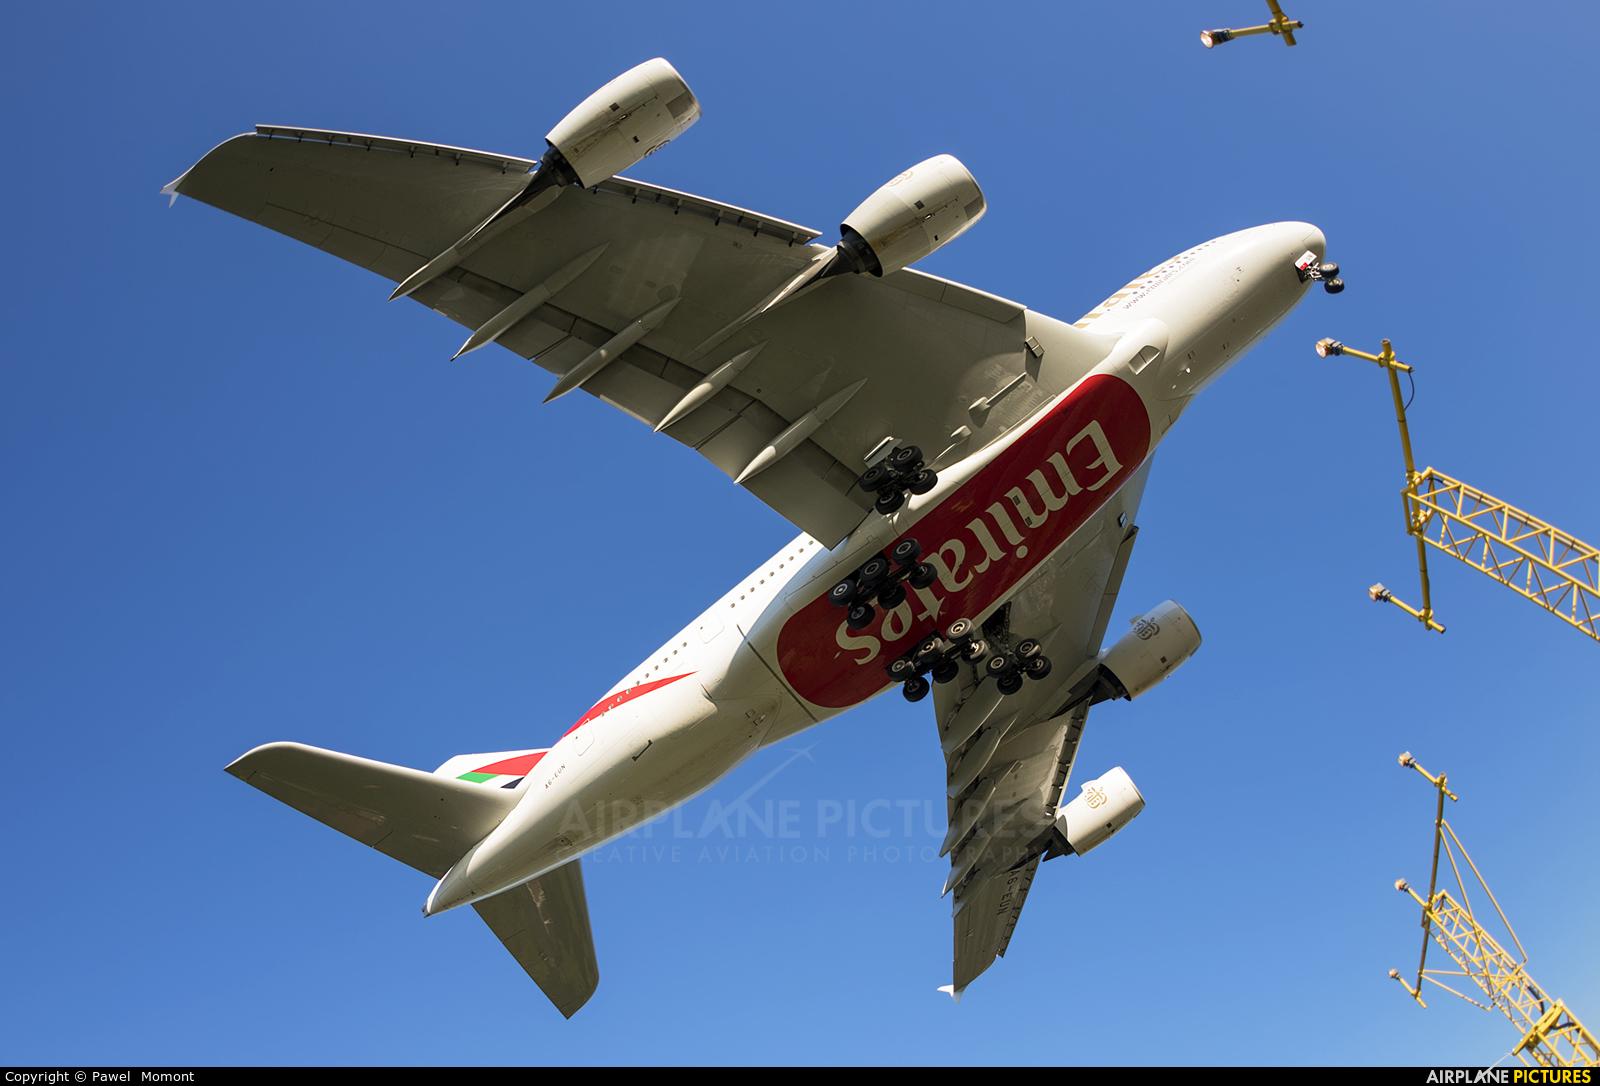 Emirates Airlines A6-EUN aircraft at Manchester